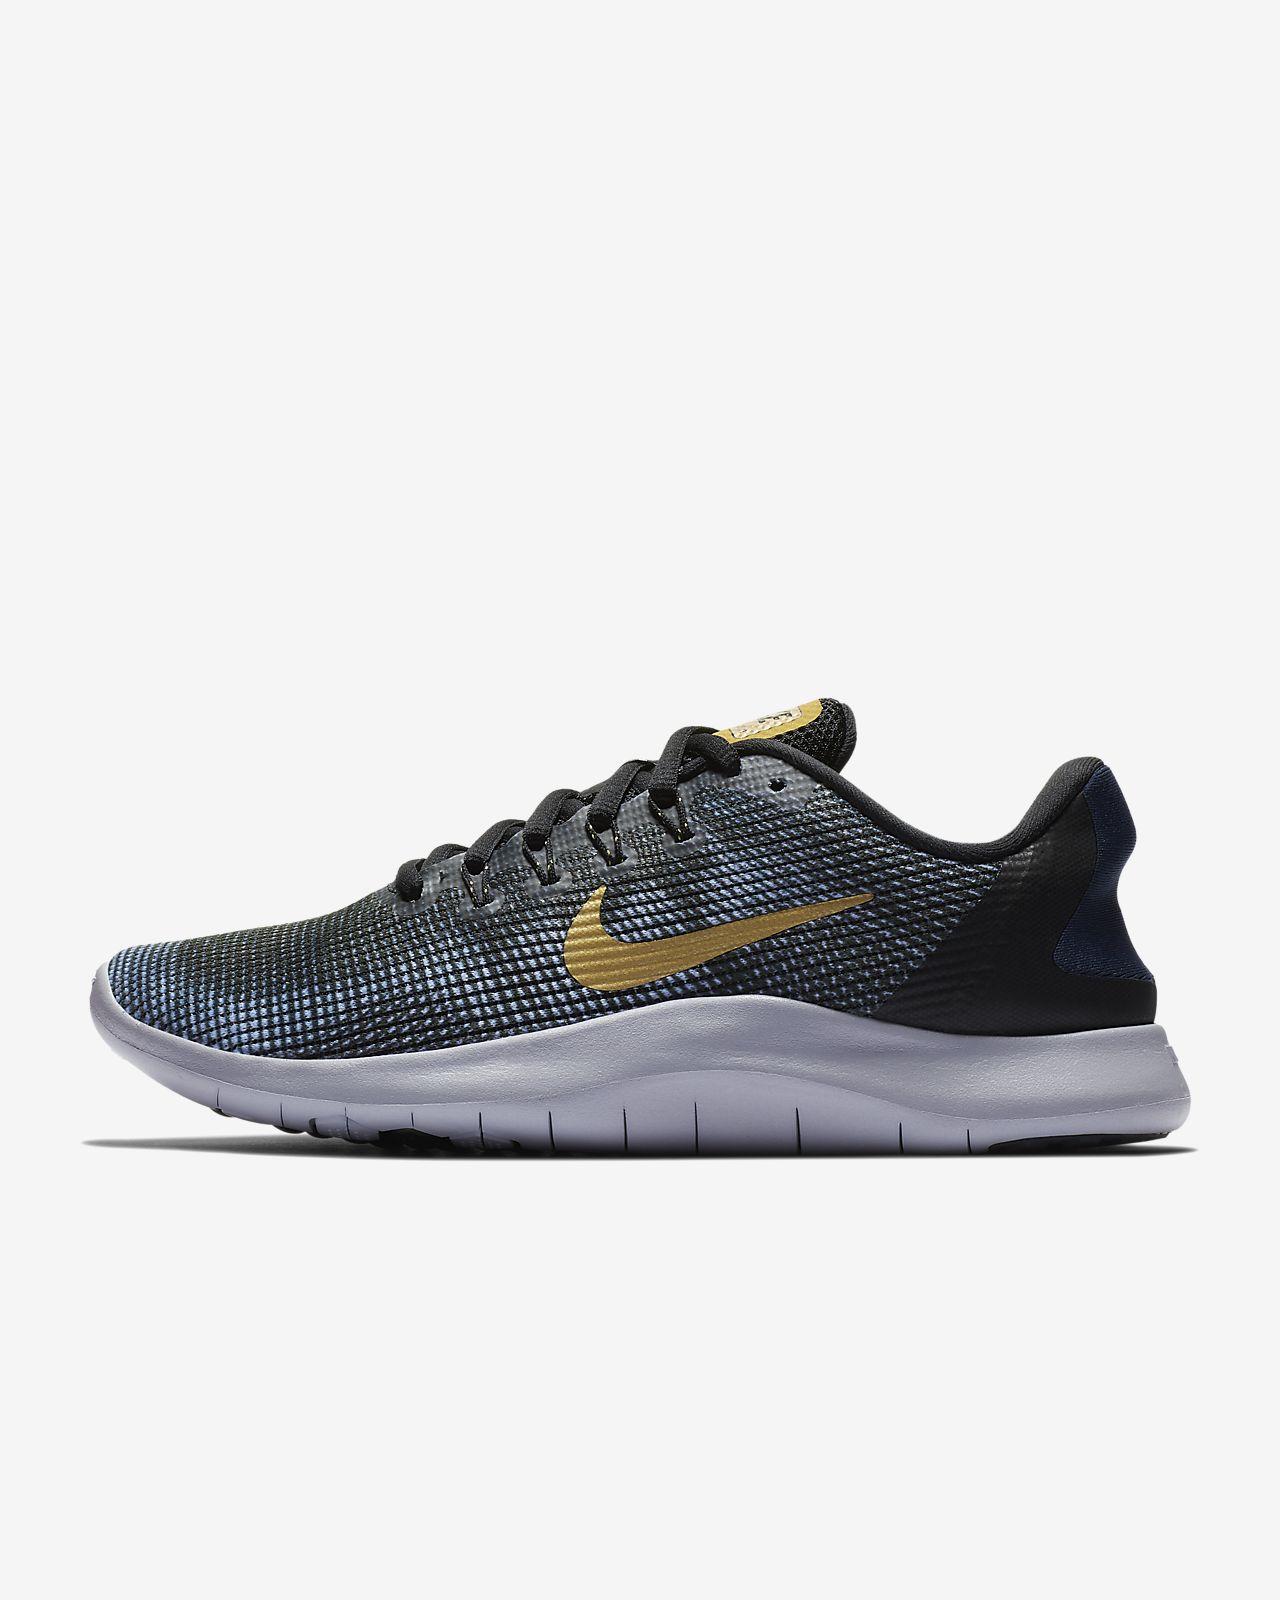 b705c000434 ... closeout nike flex rn 2018 womens running shoe 7ca0a 407ba